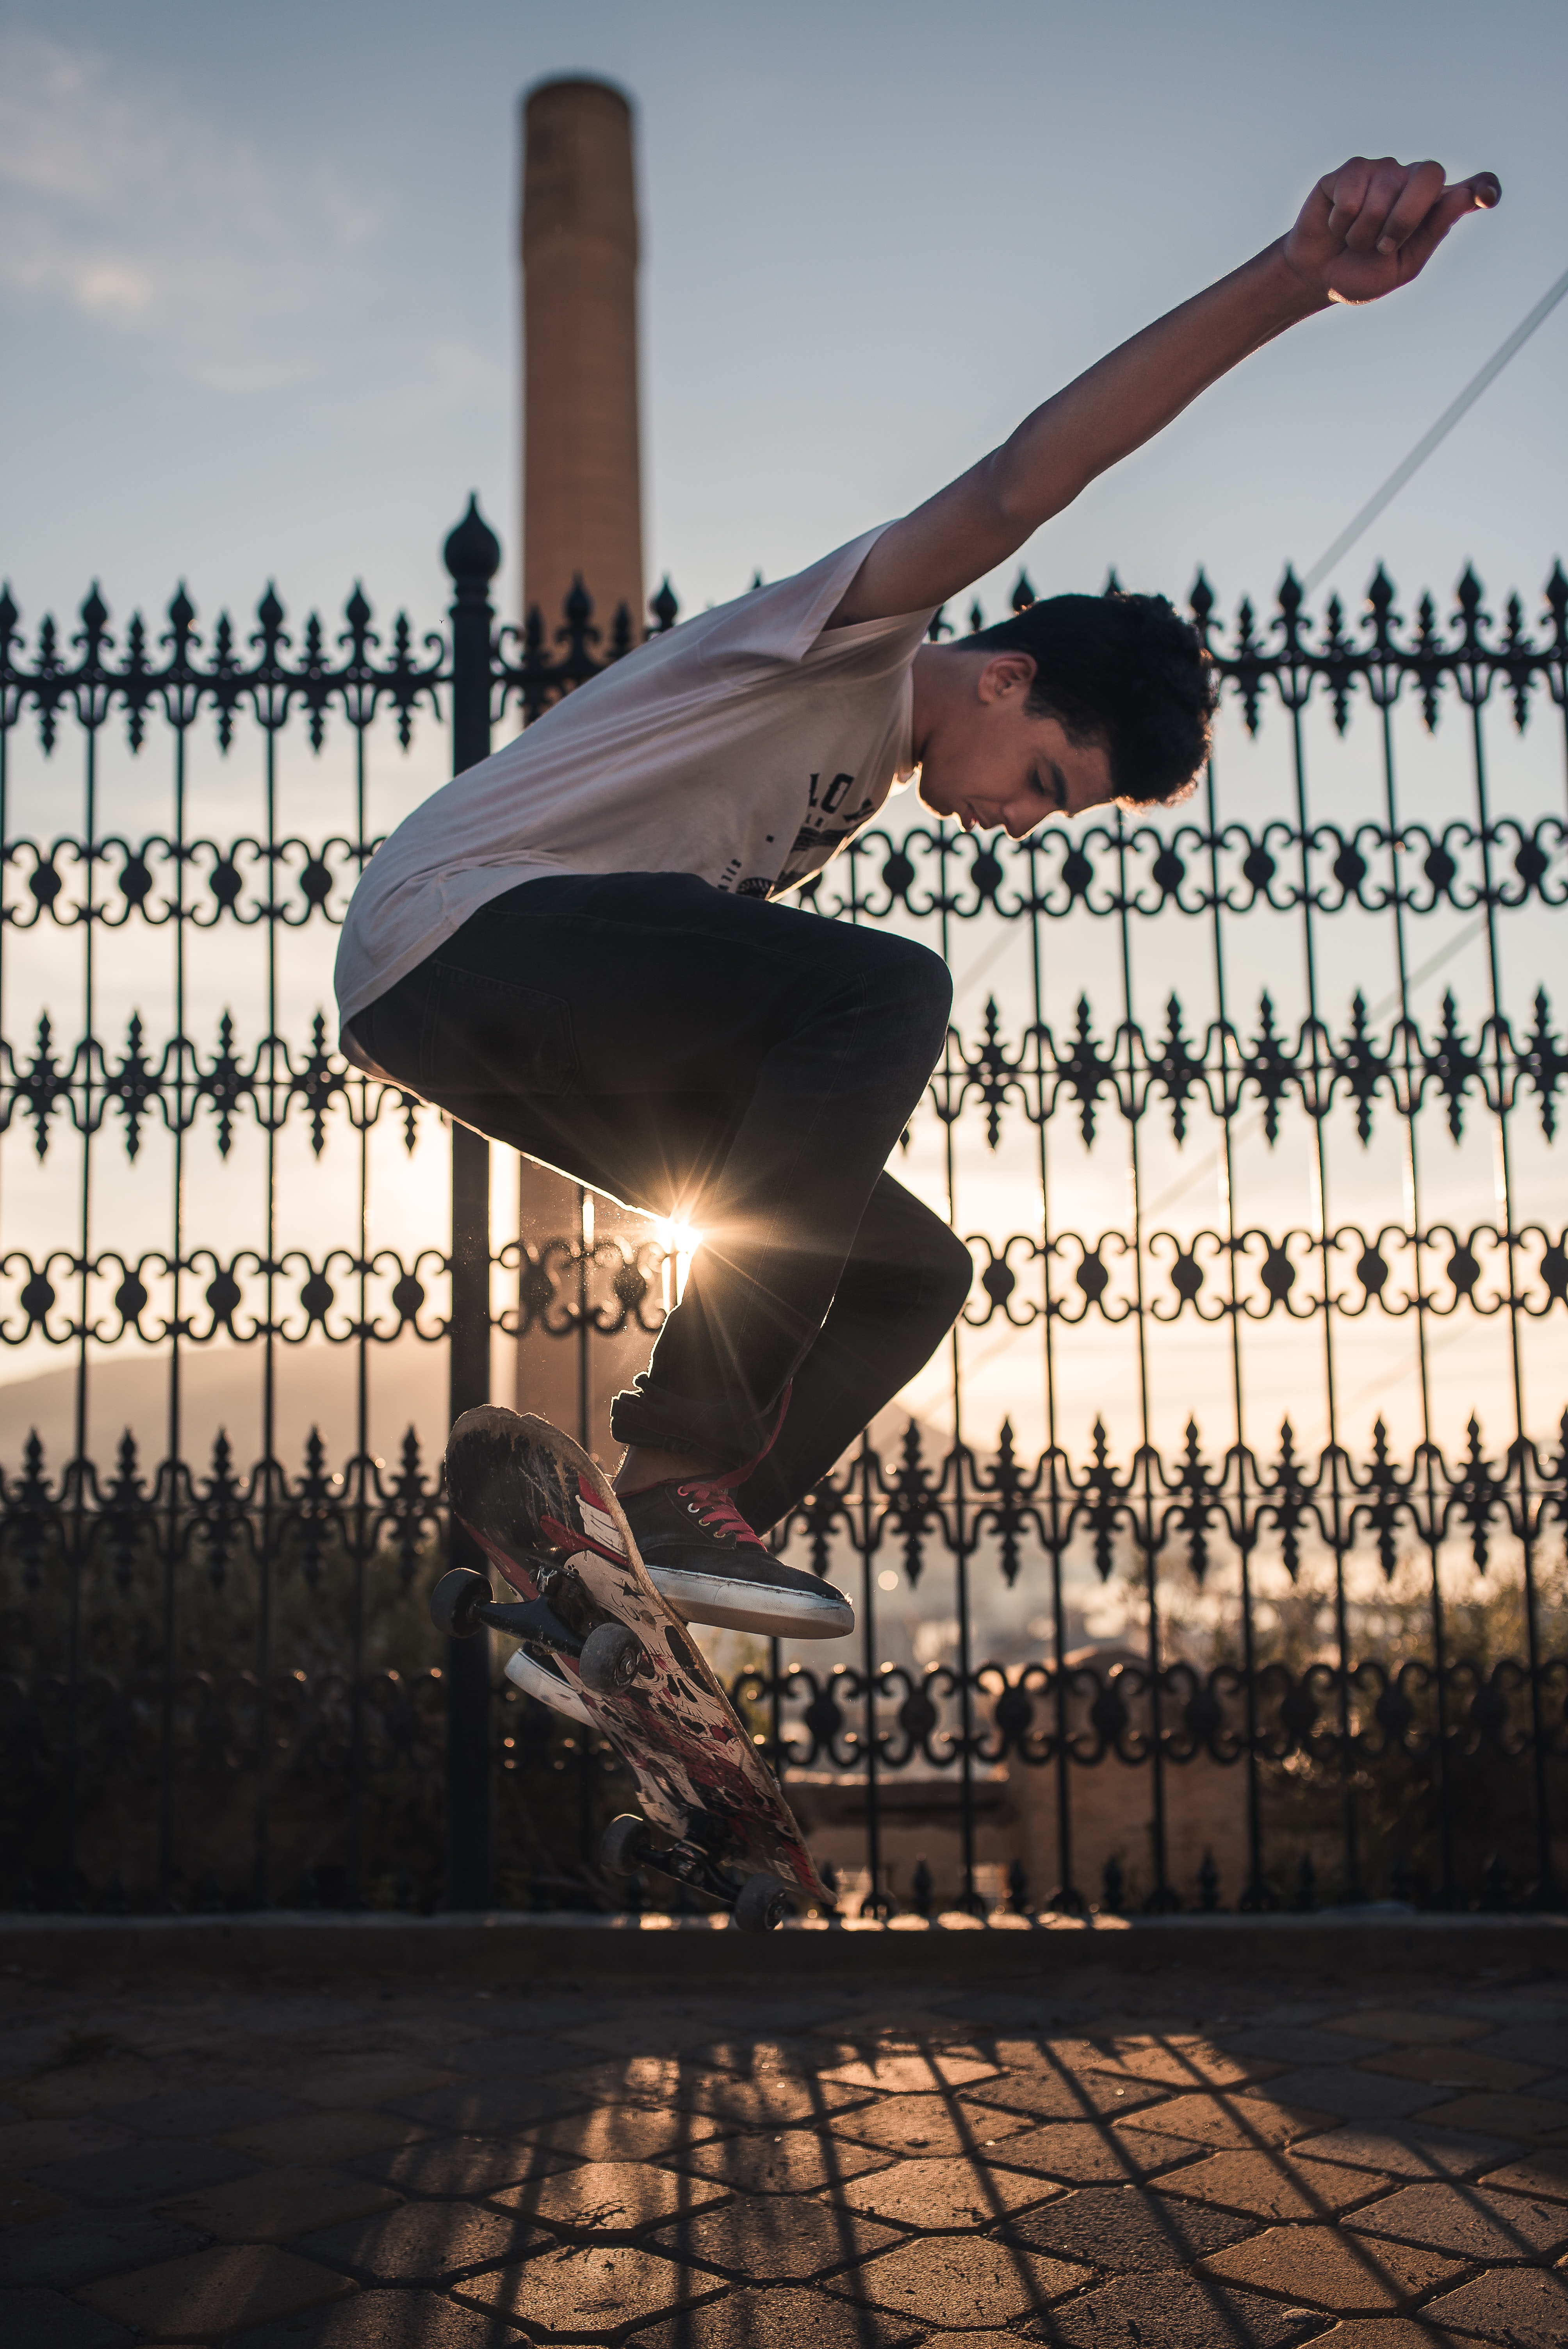 man doing skateboard trick near black steel fence during daytime